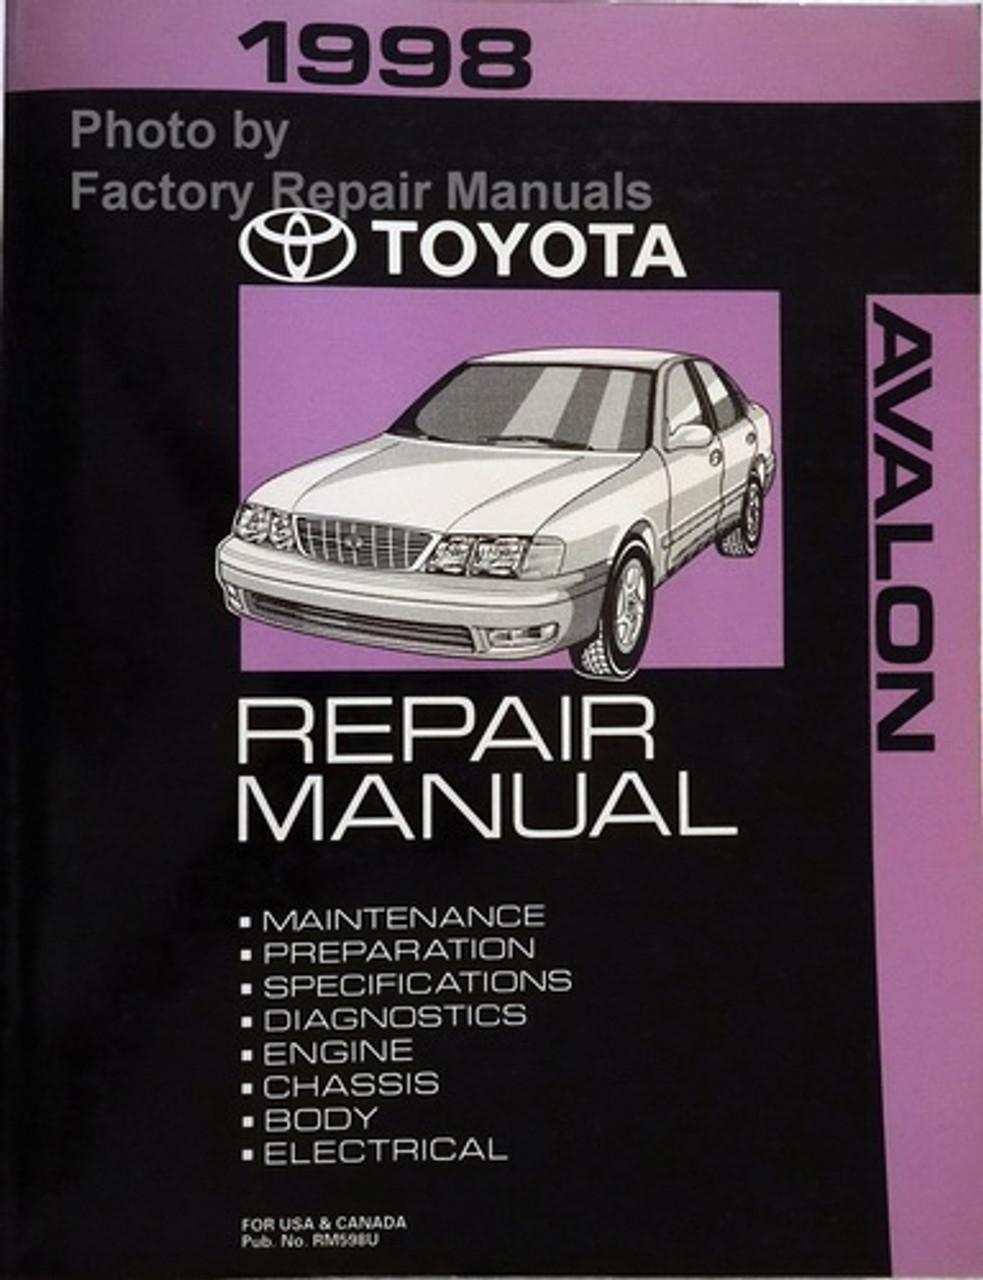 1998 Toyota Avalon Wiring Diagram from cdn11.bigcommerce.com